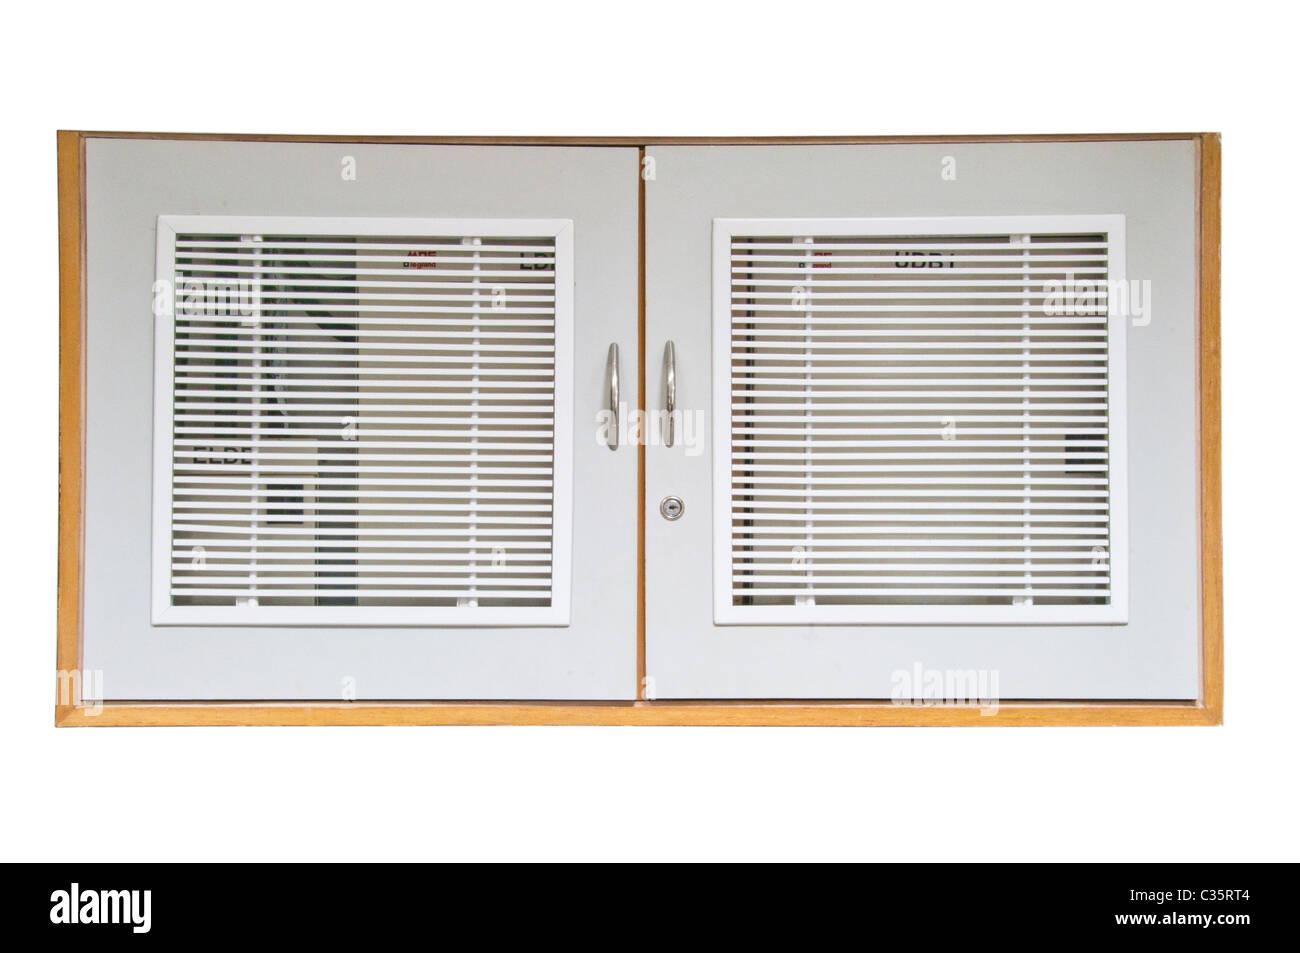 Closed shelves on white background - Stock Image